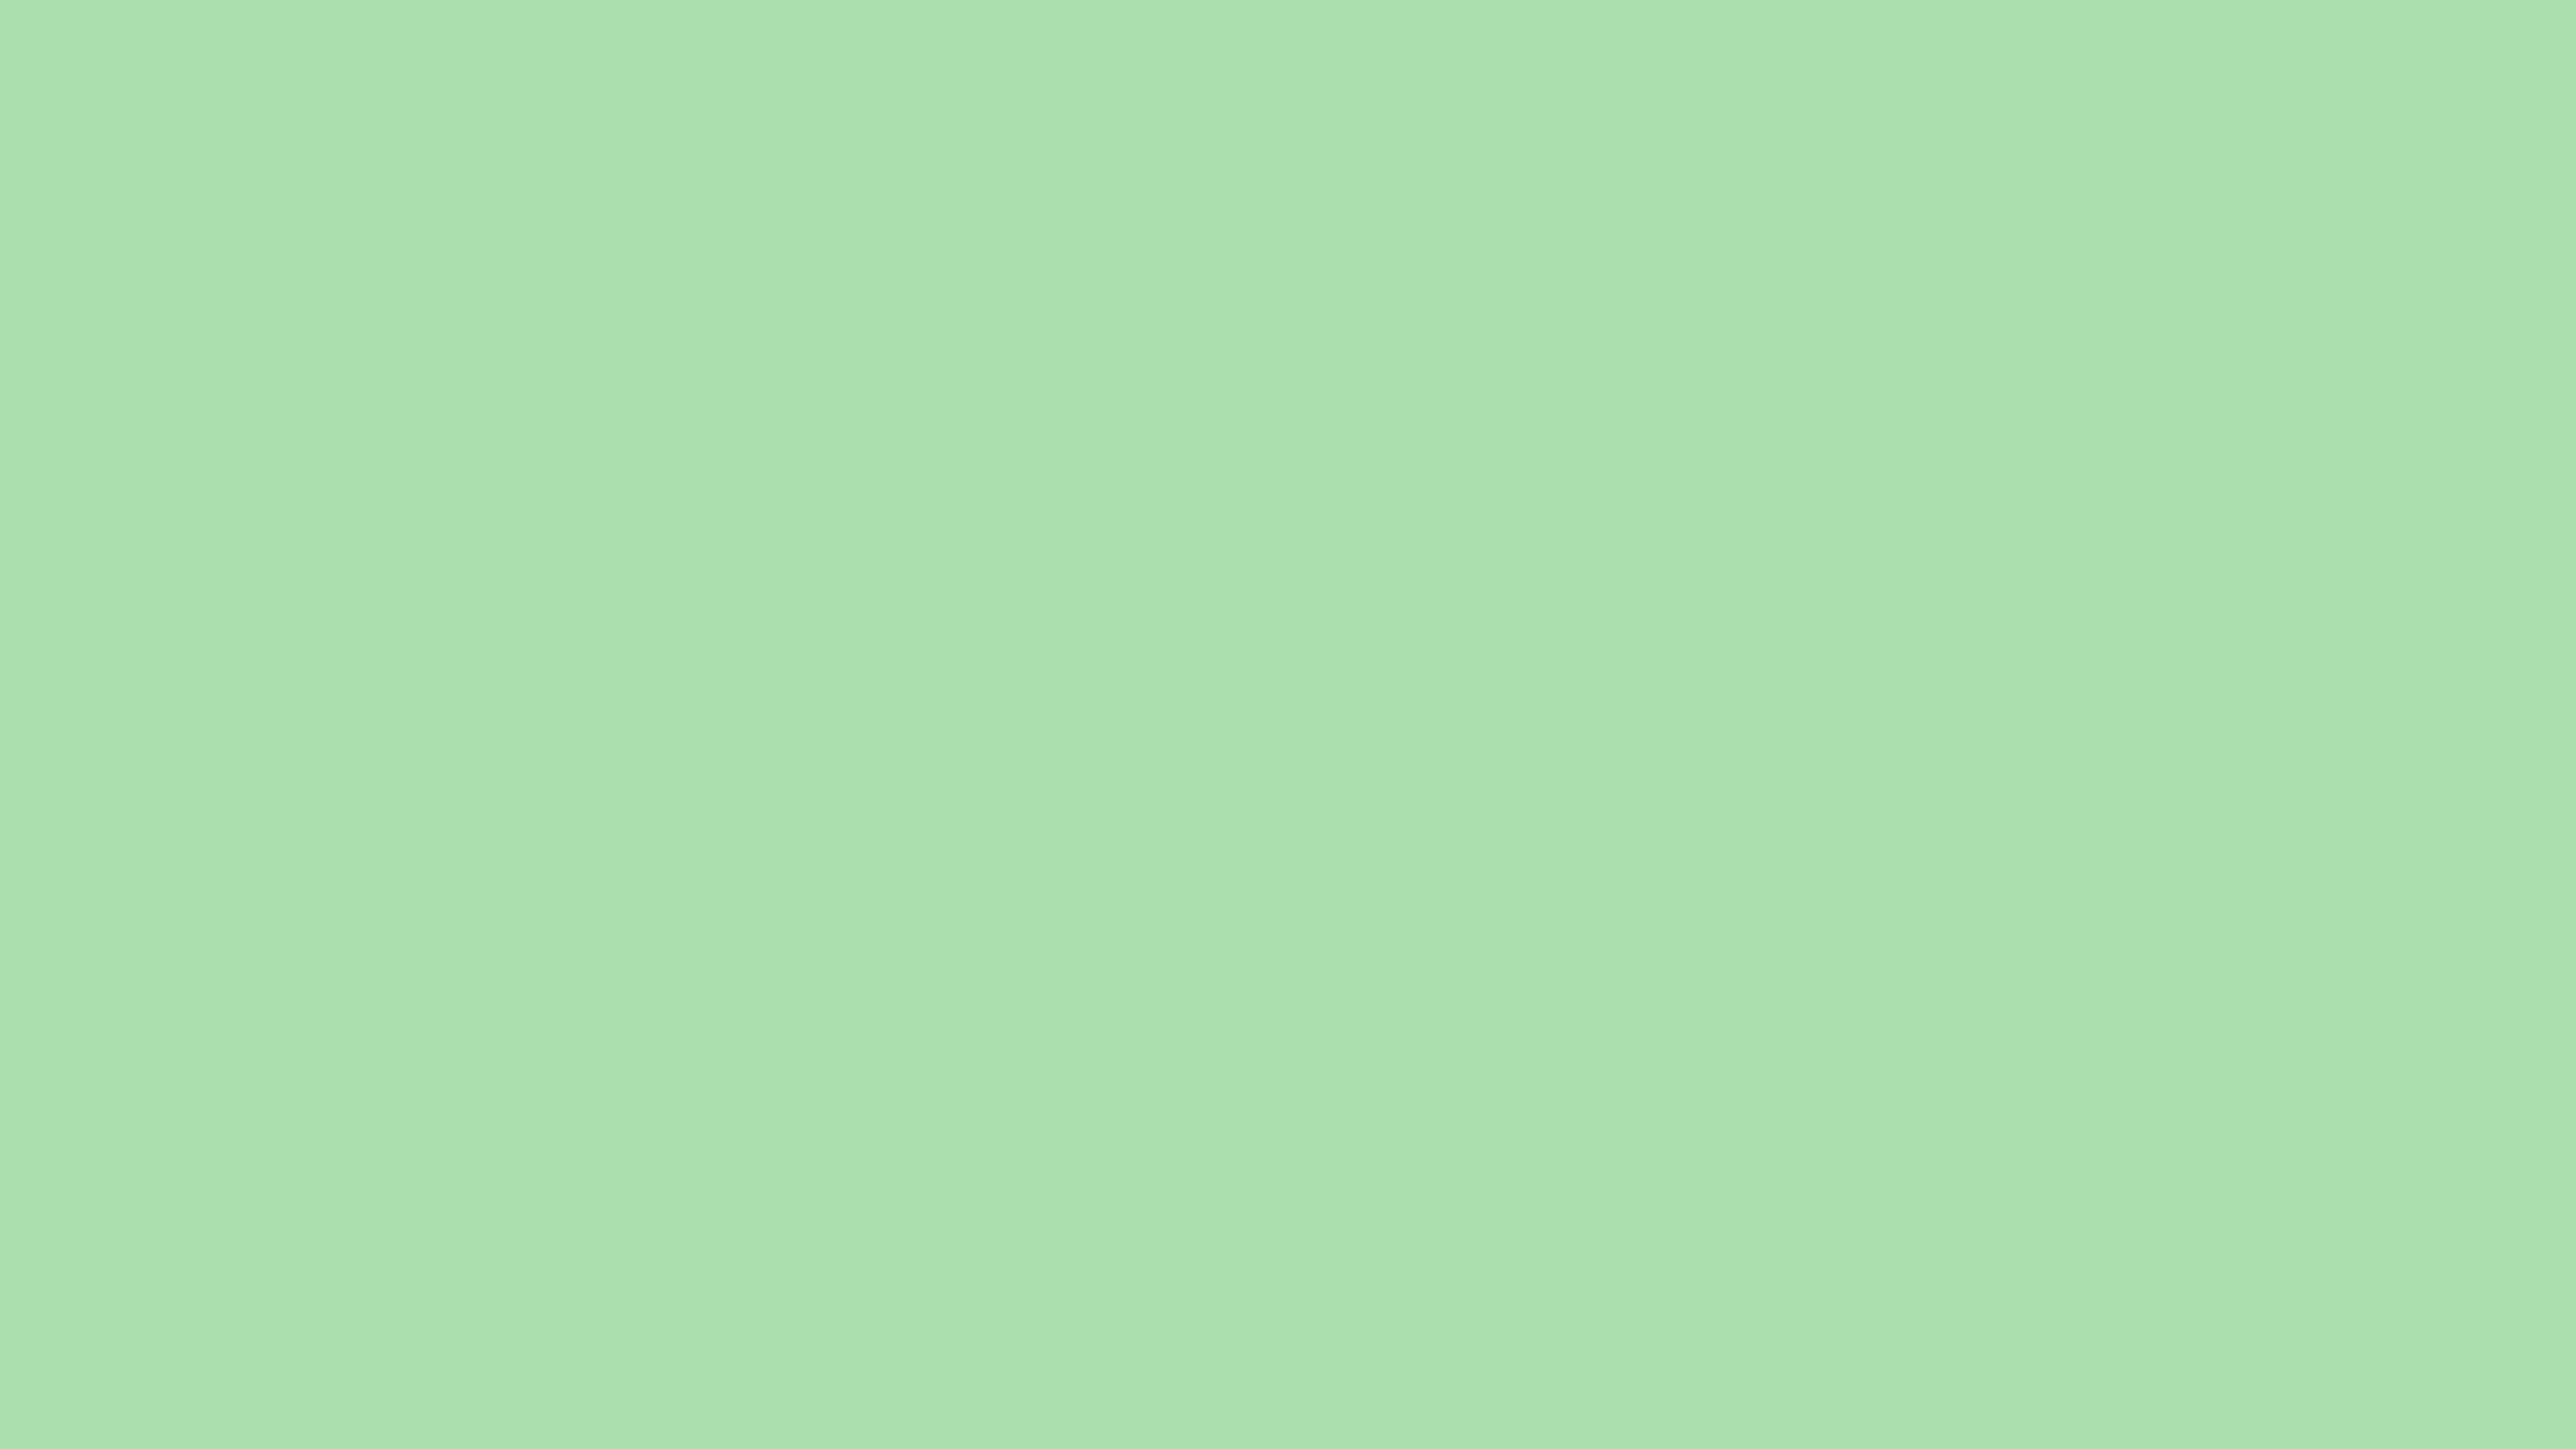 4096x2304 Celadon Solid Color Background